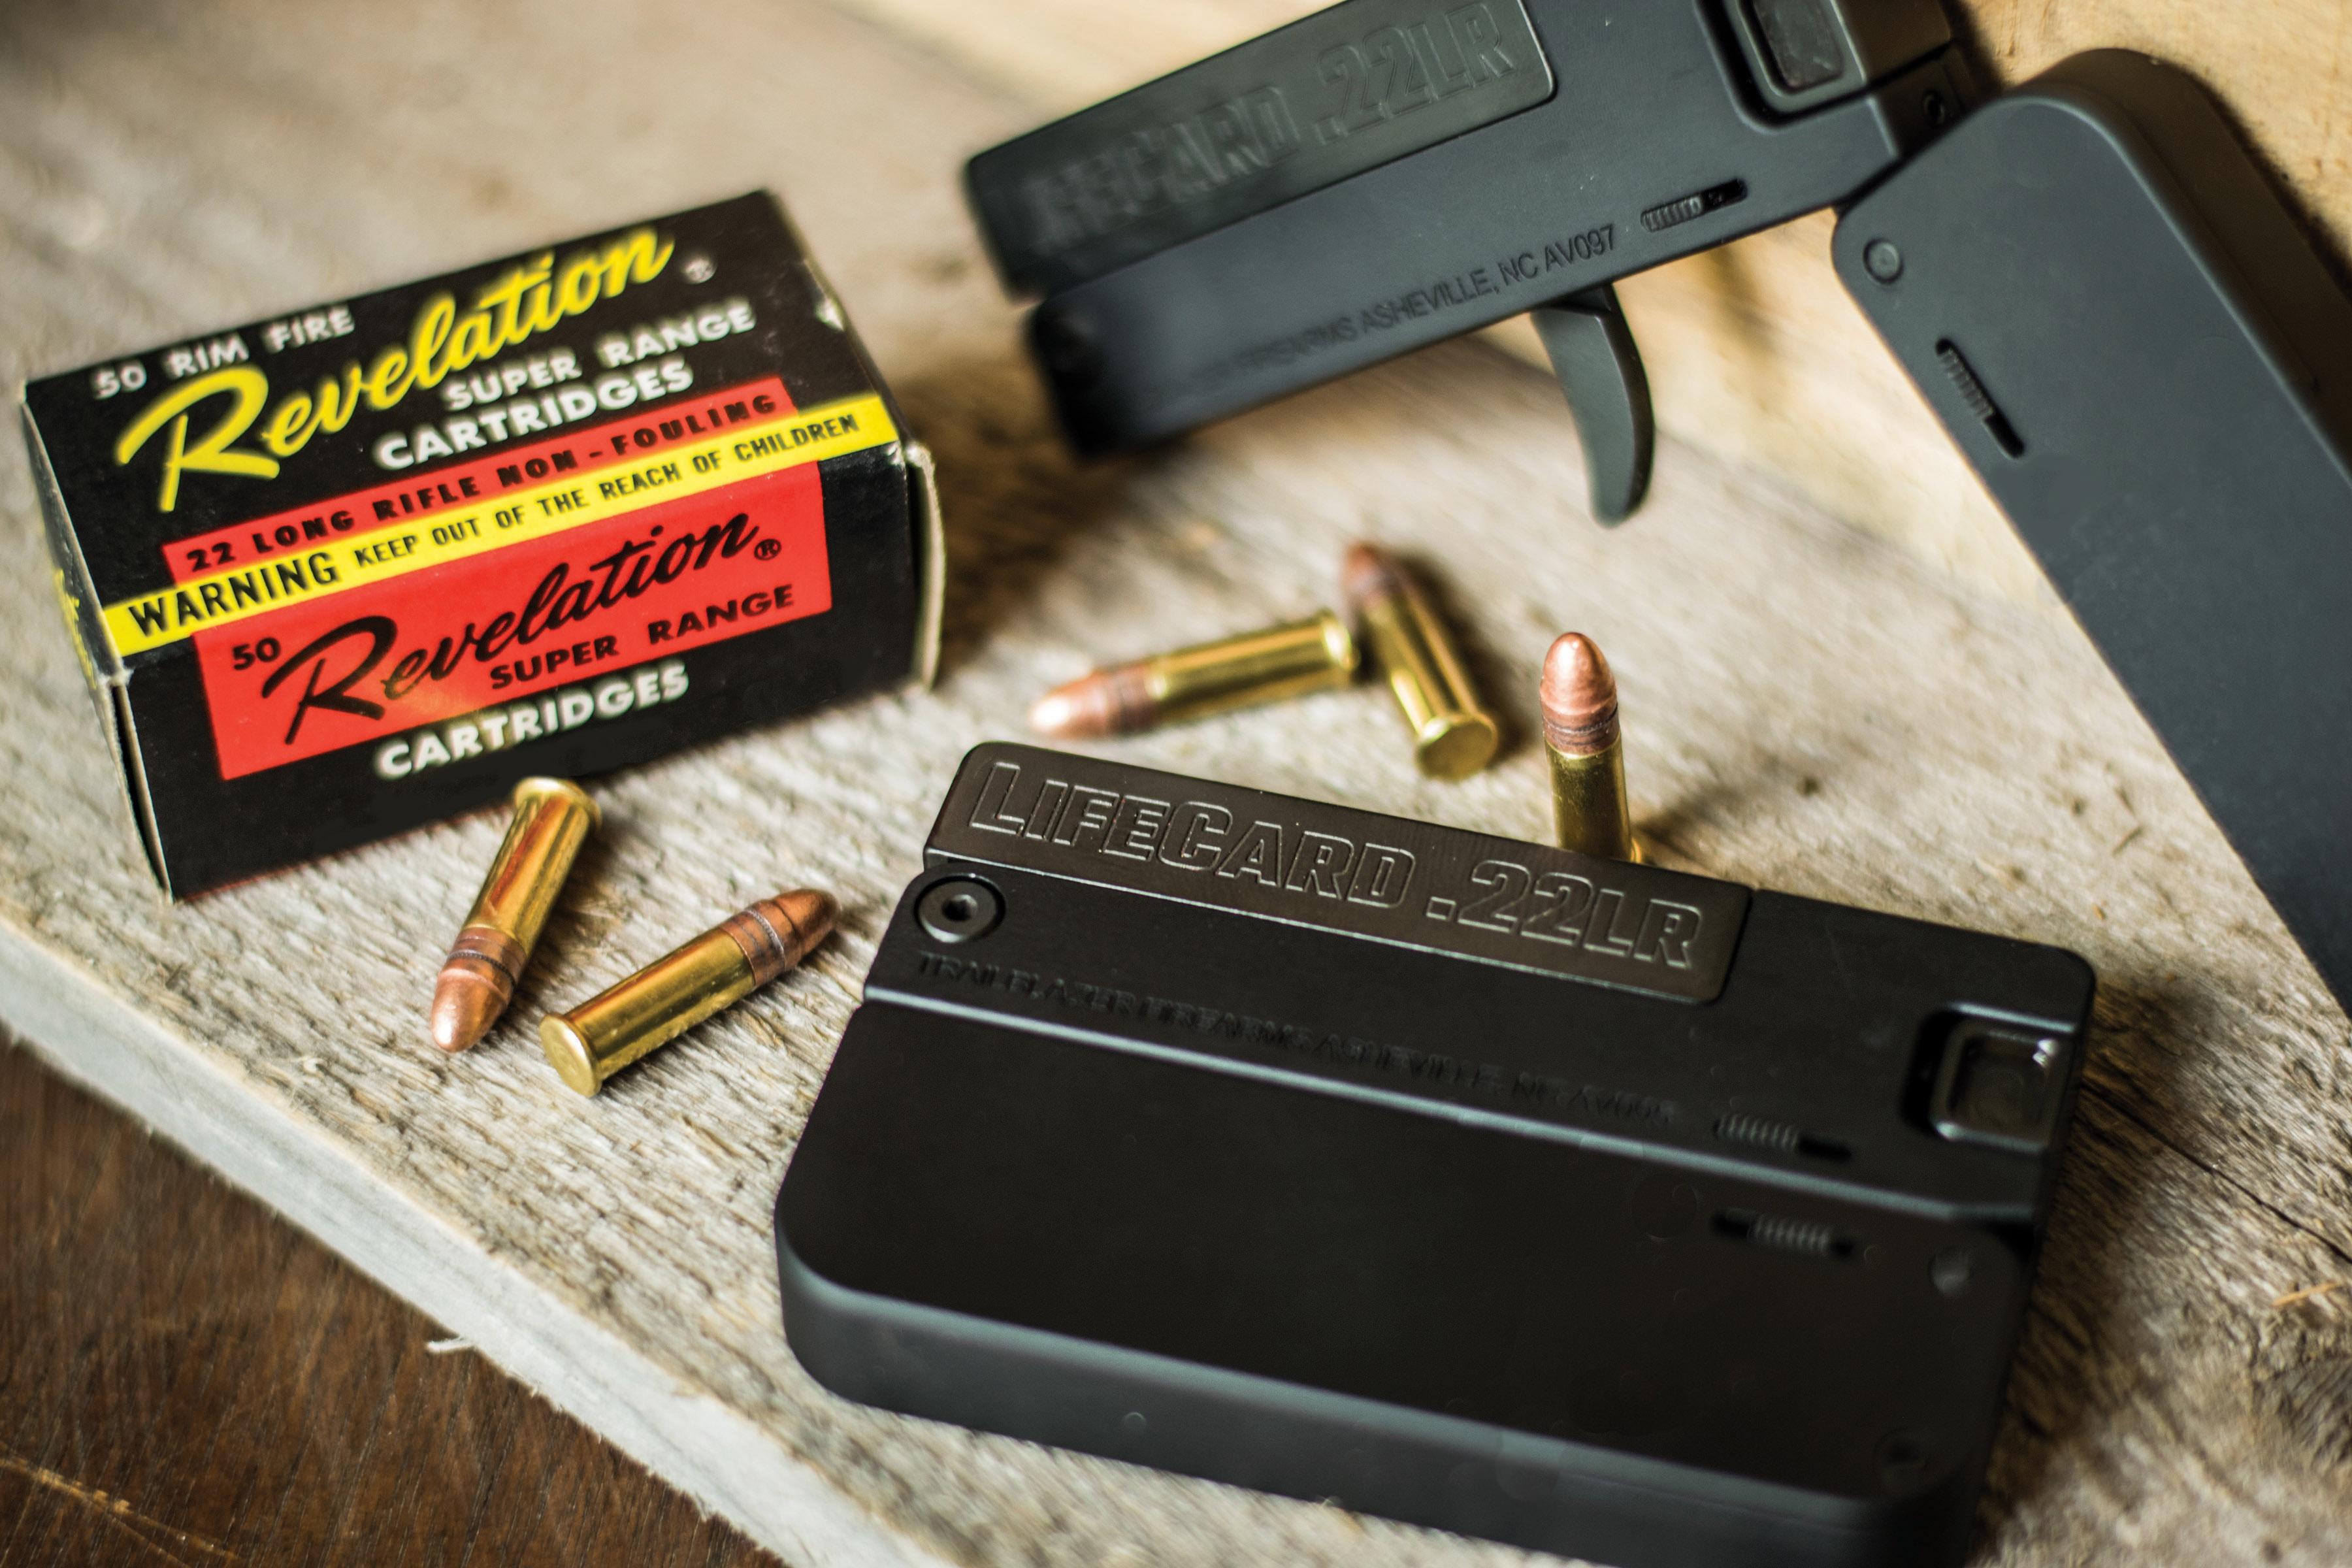 Trailblazer® Firearms Adds Hicks Inc. as New Distributor